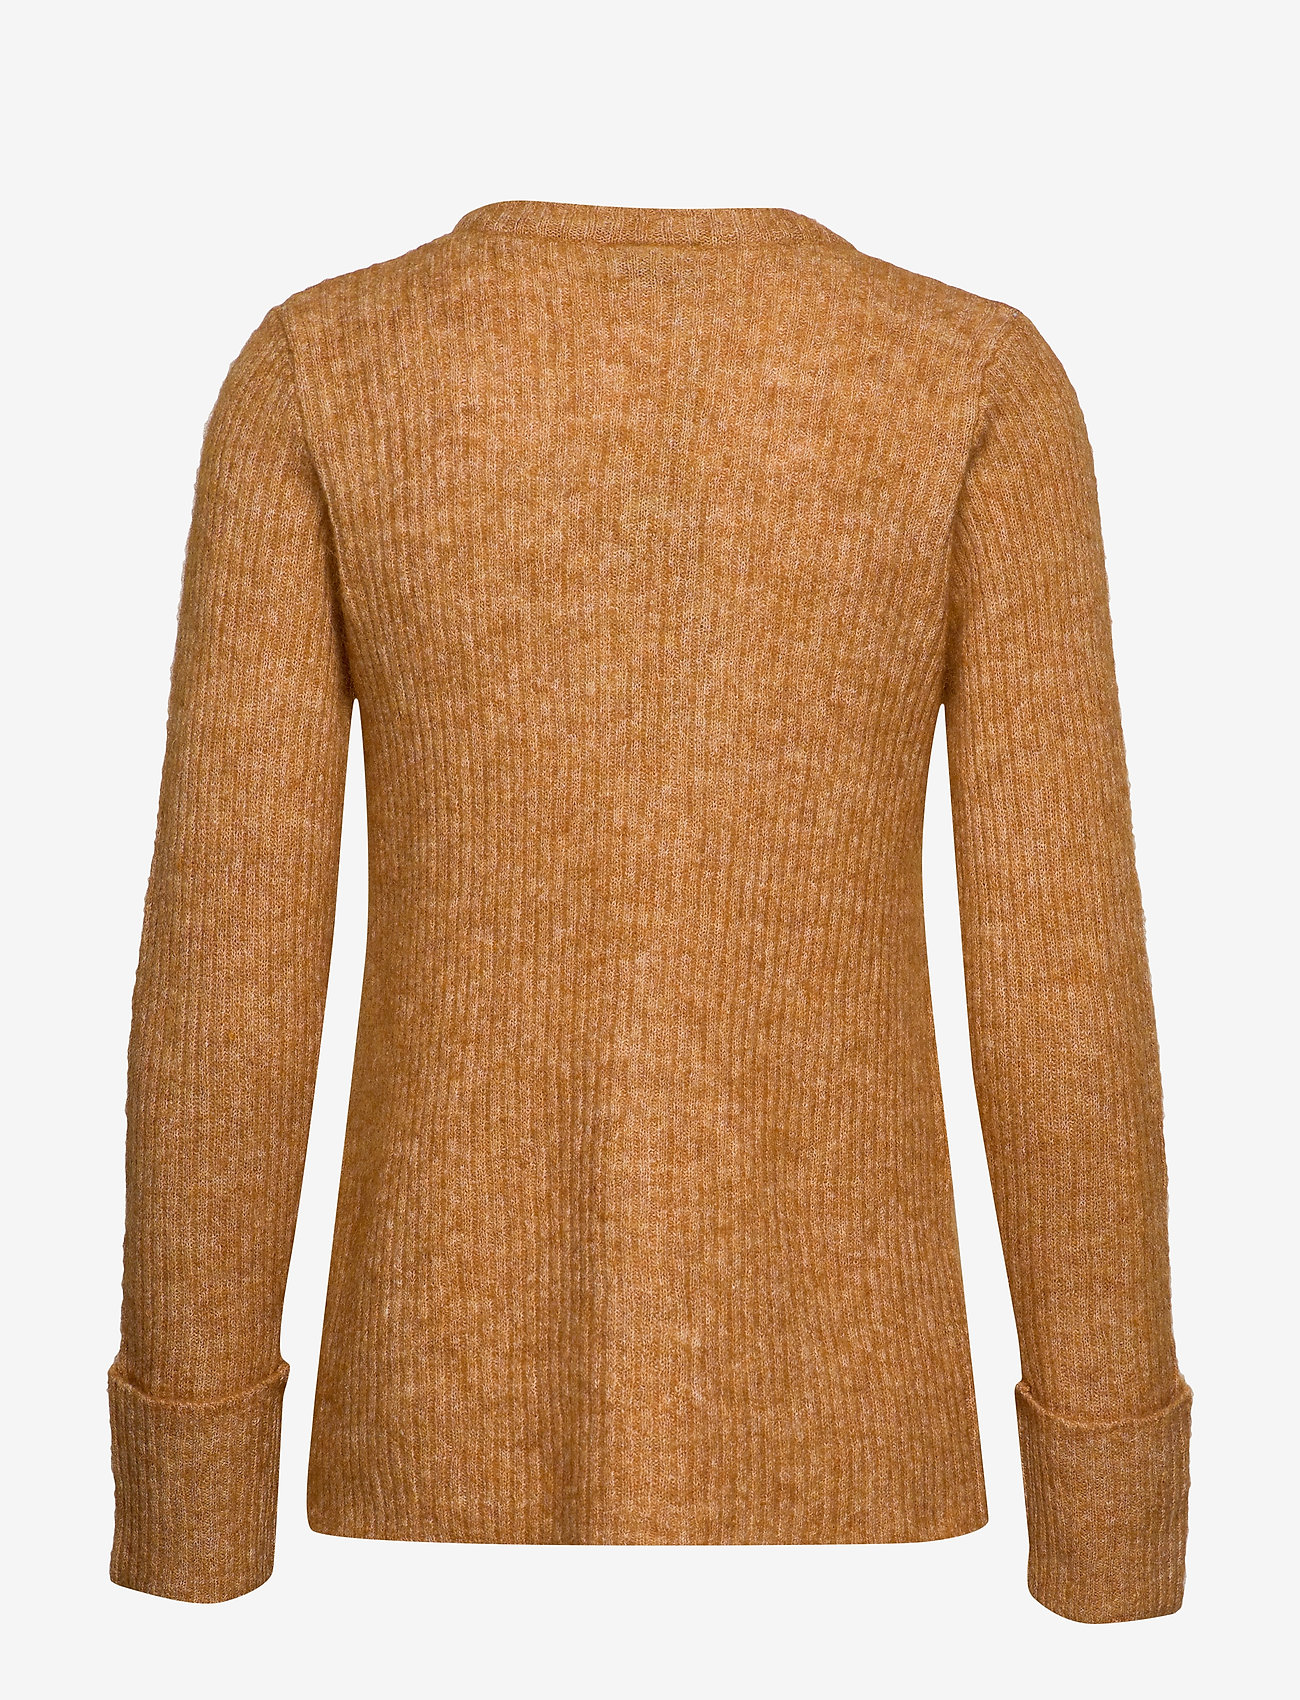 Free/quent Moto-s-pu-rib - Knitwear